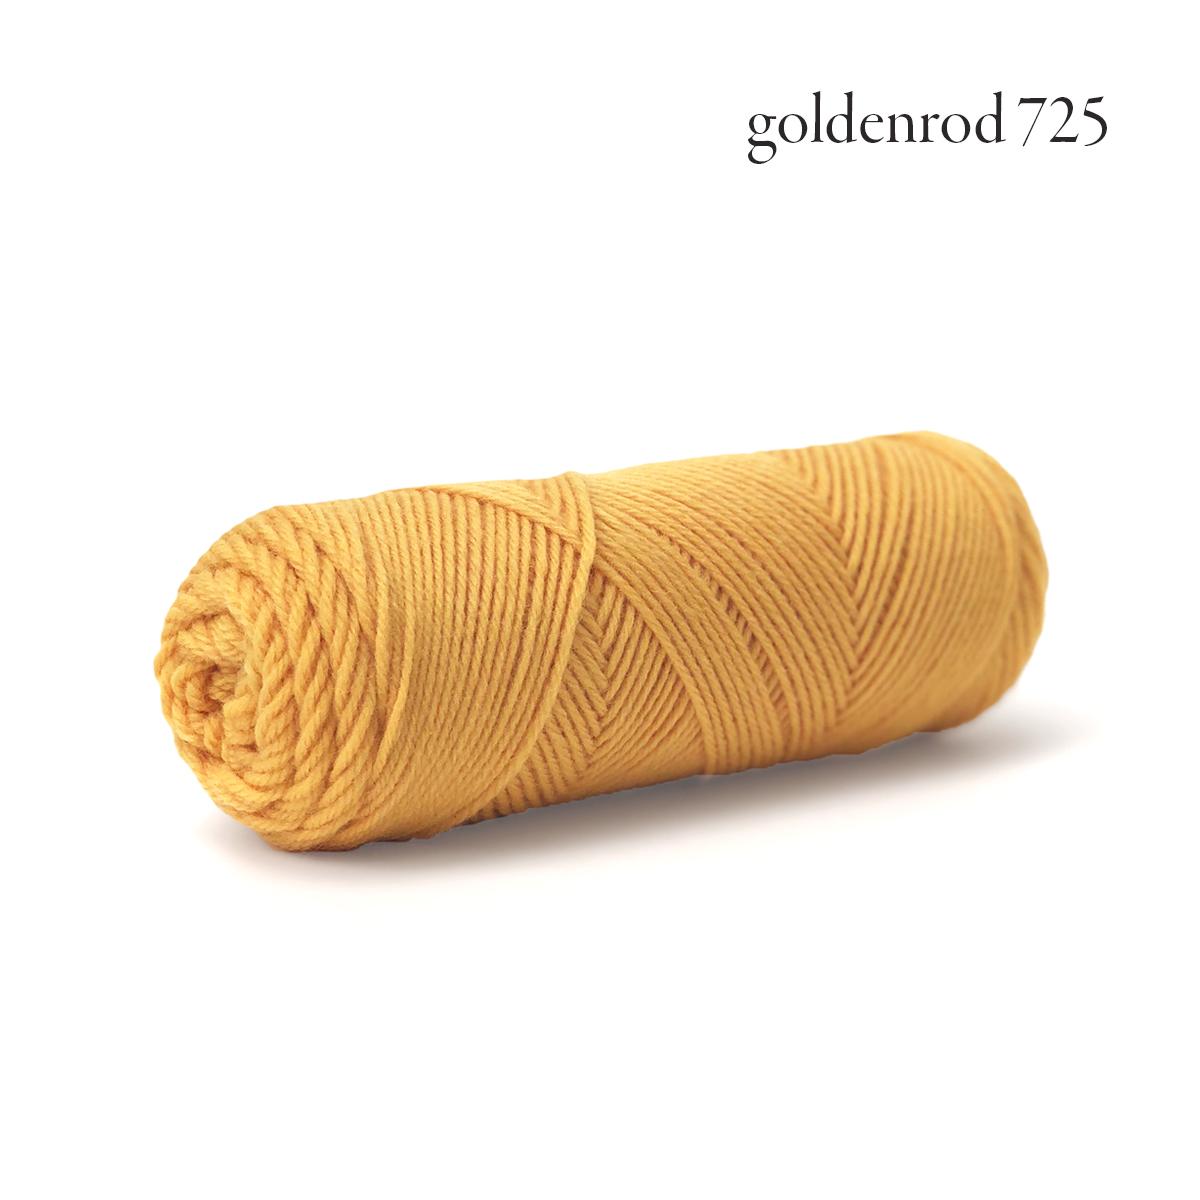 Germantown goldenrod 725.jpg